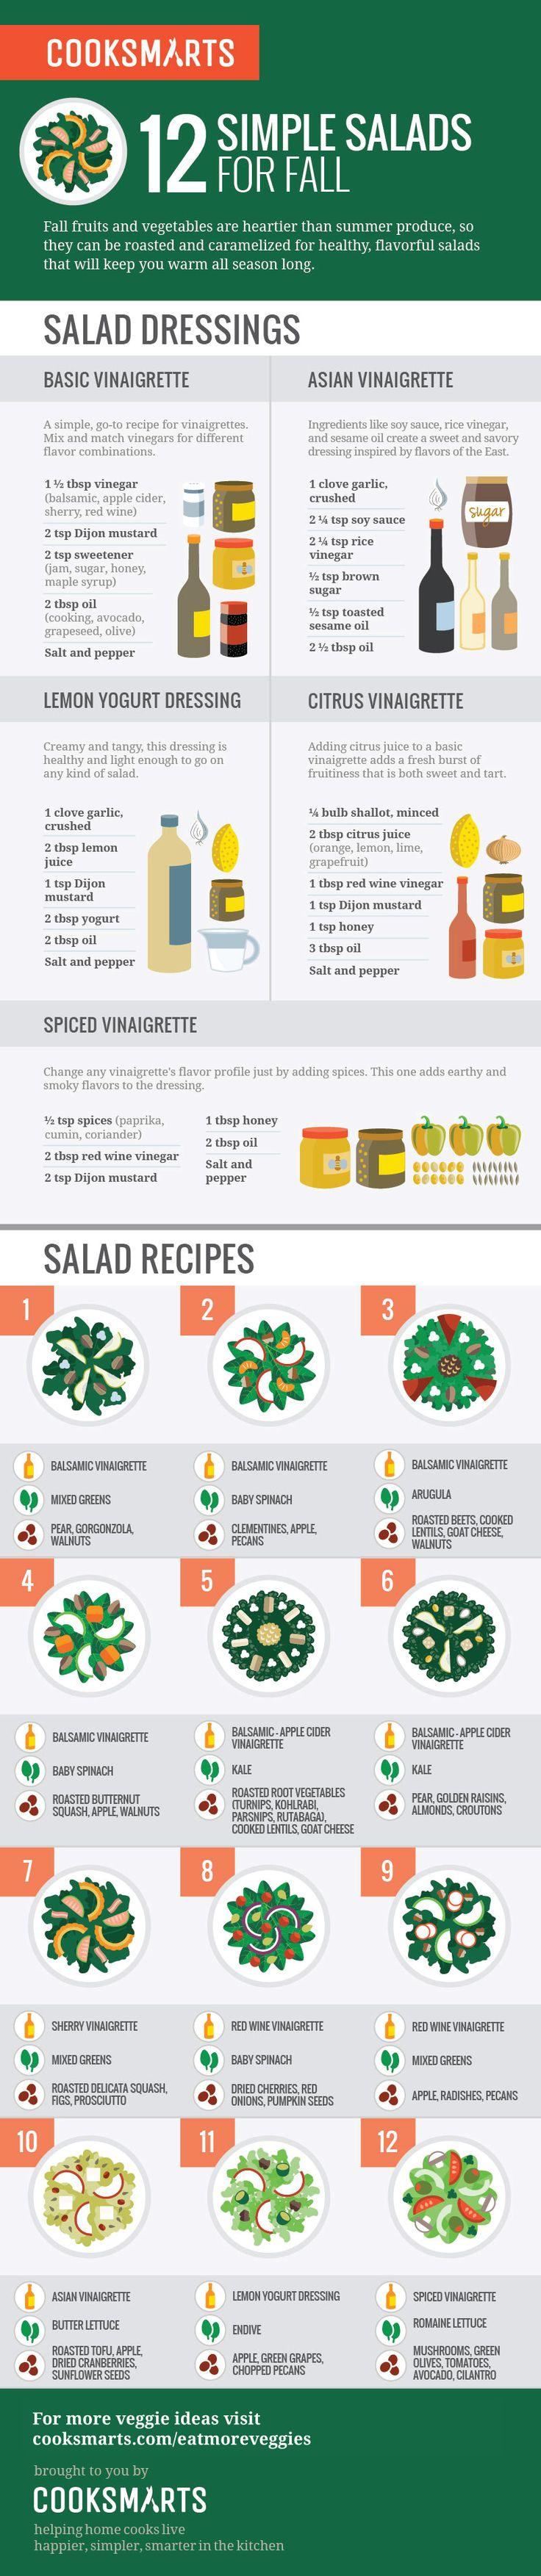 Simple Fall Salads via @CookSmarts #infographic #eatmoreveggies